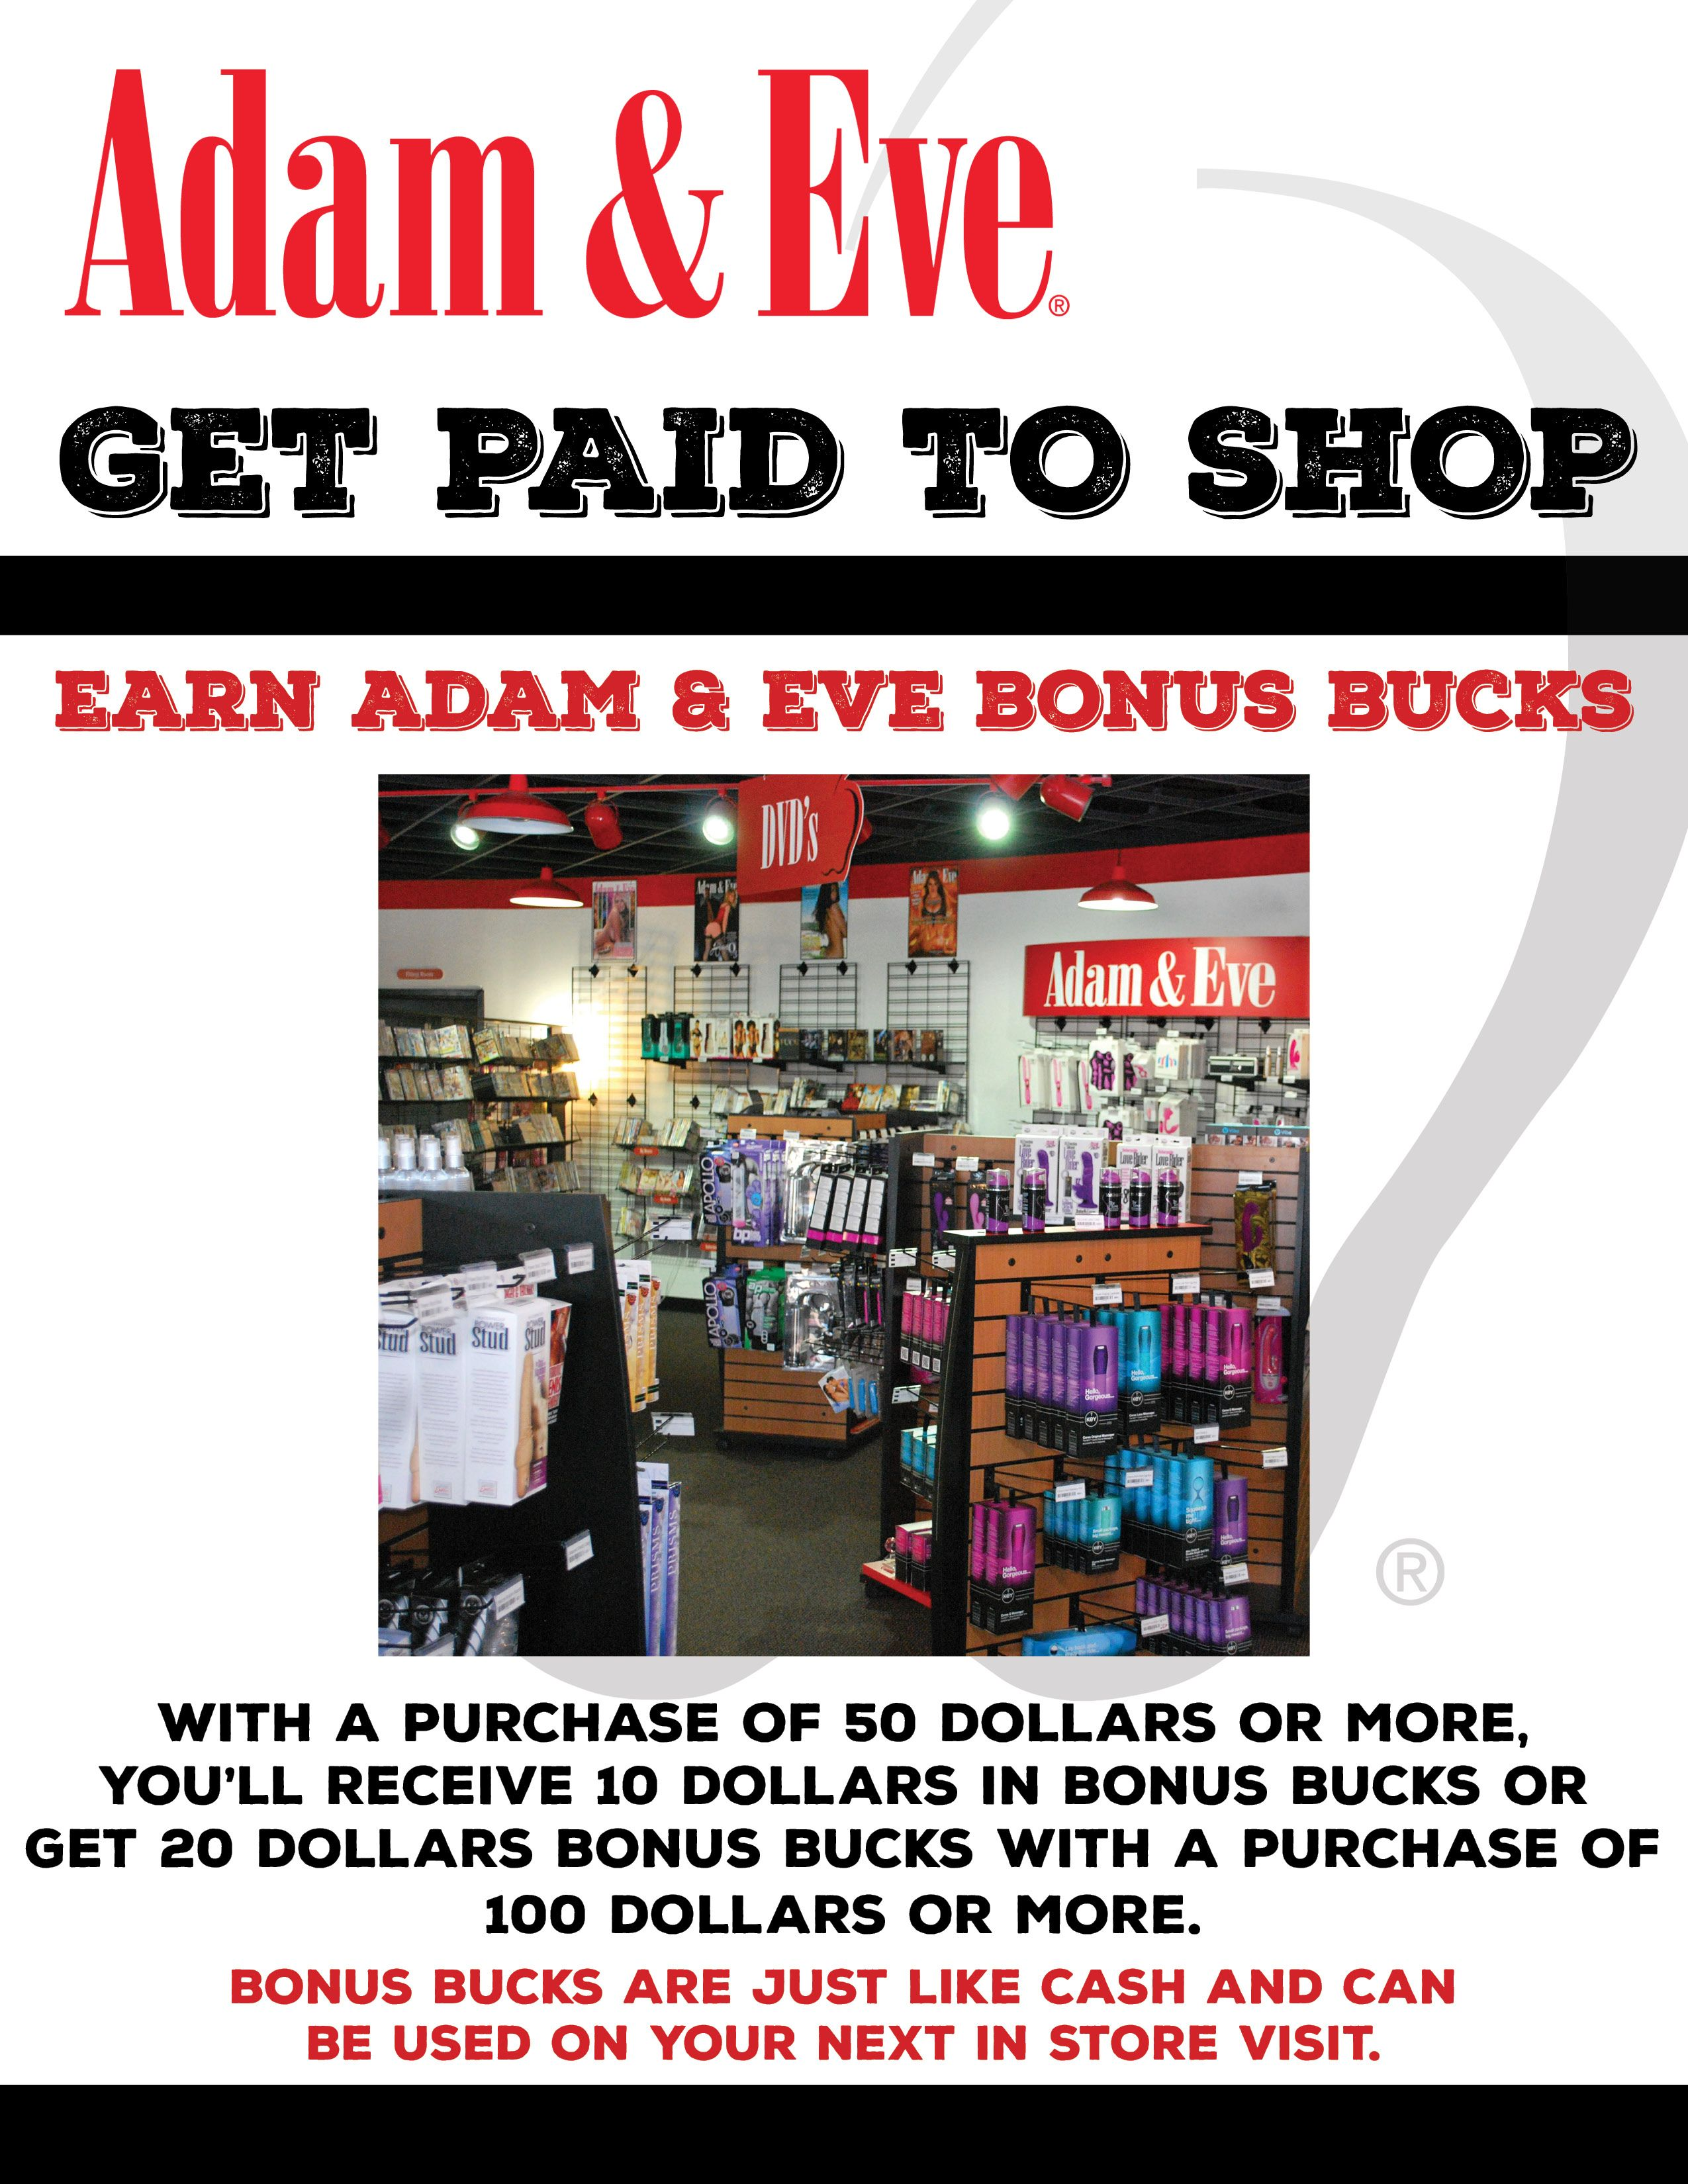 Adam and eve locations in north carolina